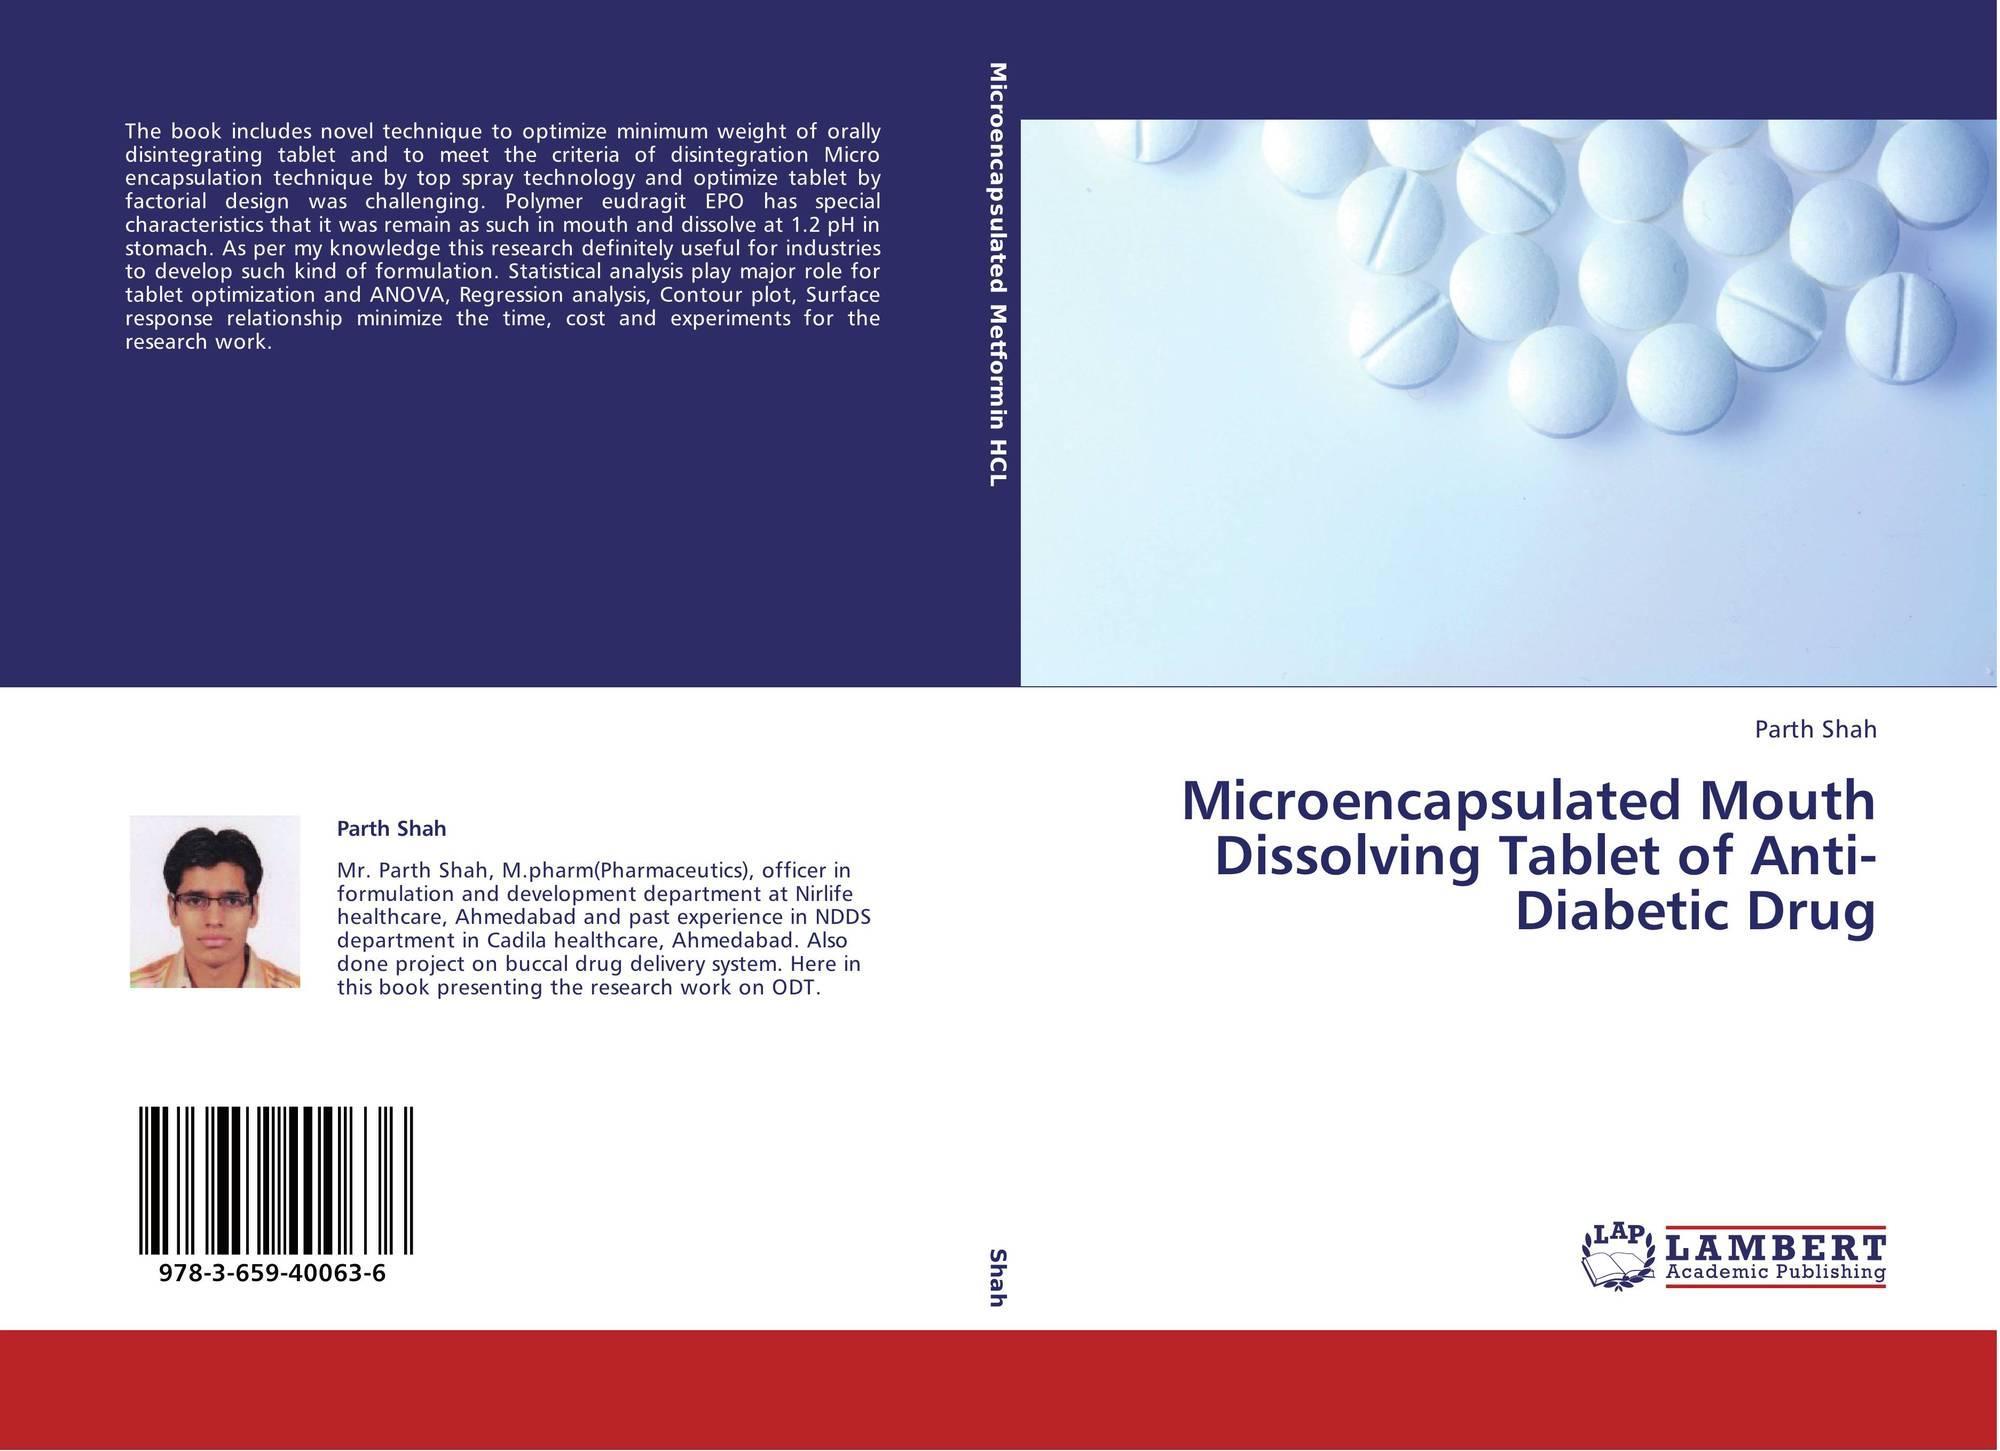 tableta bucal mucoadhesiva de carvedilol y diabetes